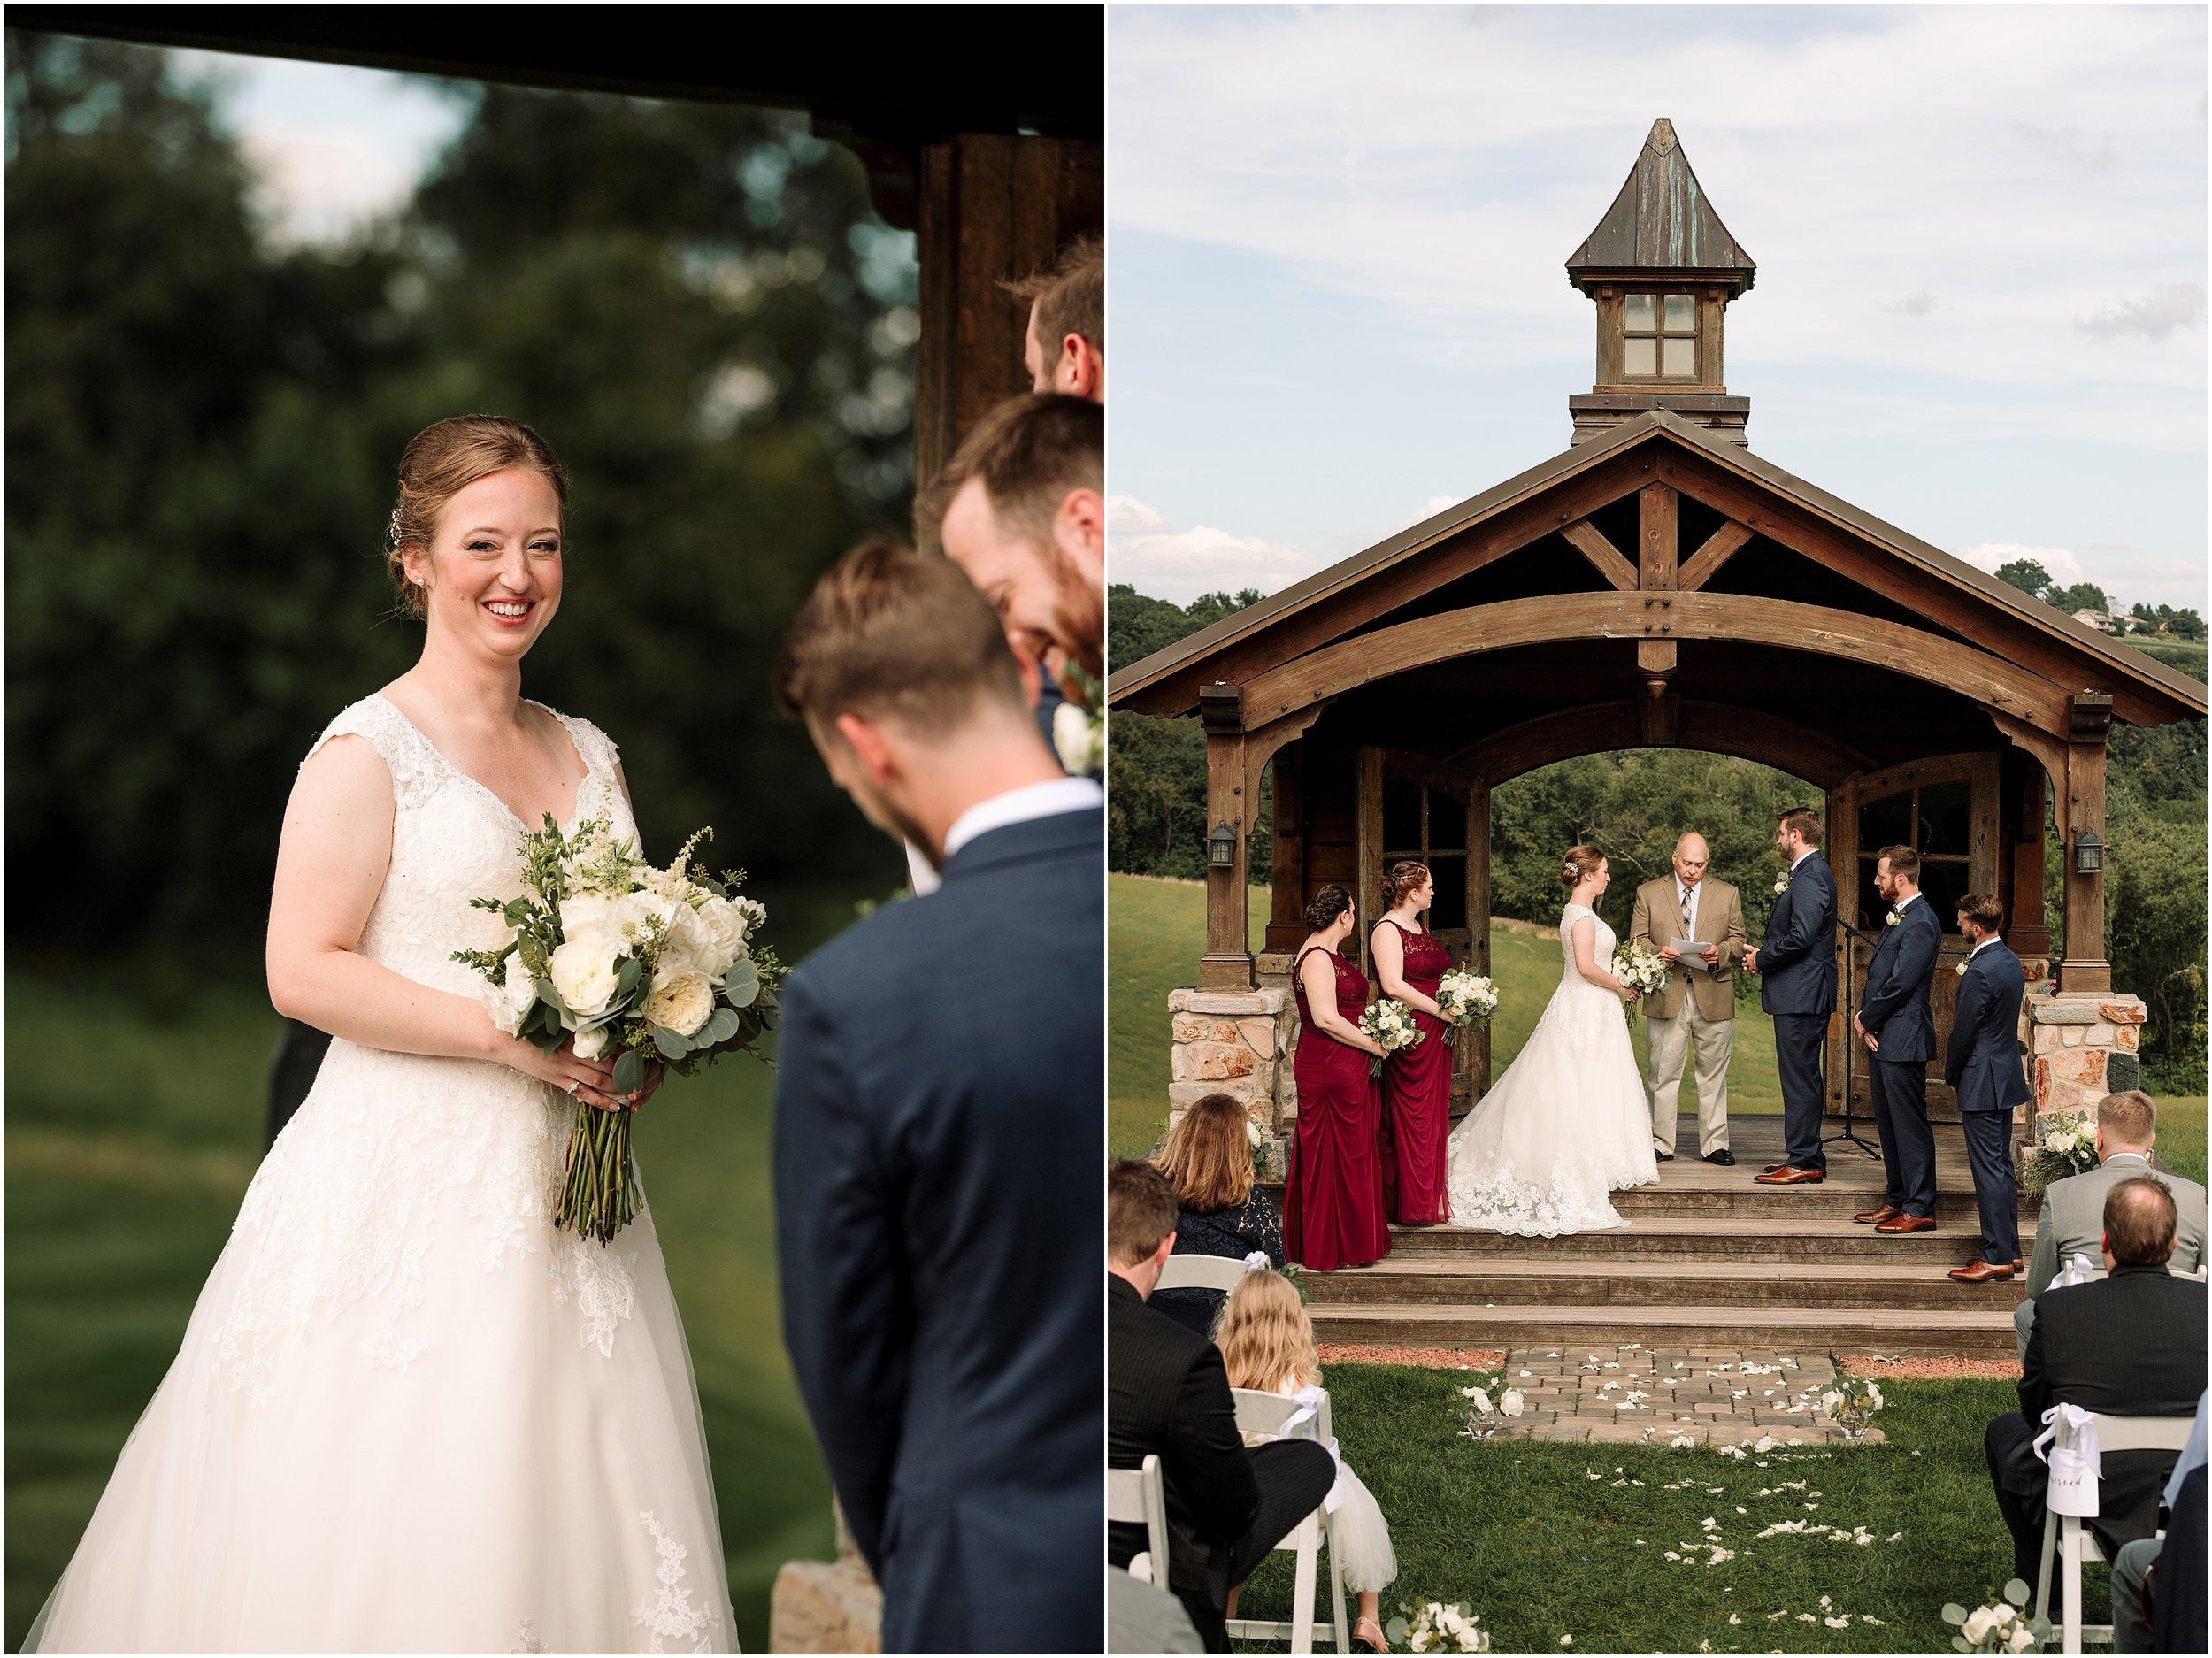 hannah leigh photography Wyndridge Farm Wedding York PA_1521.jpg